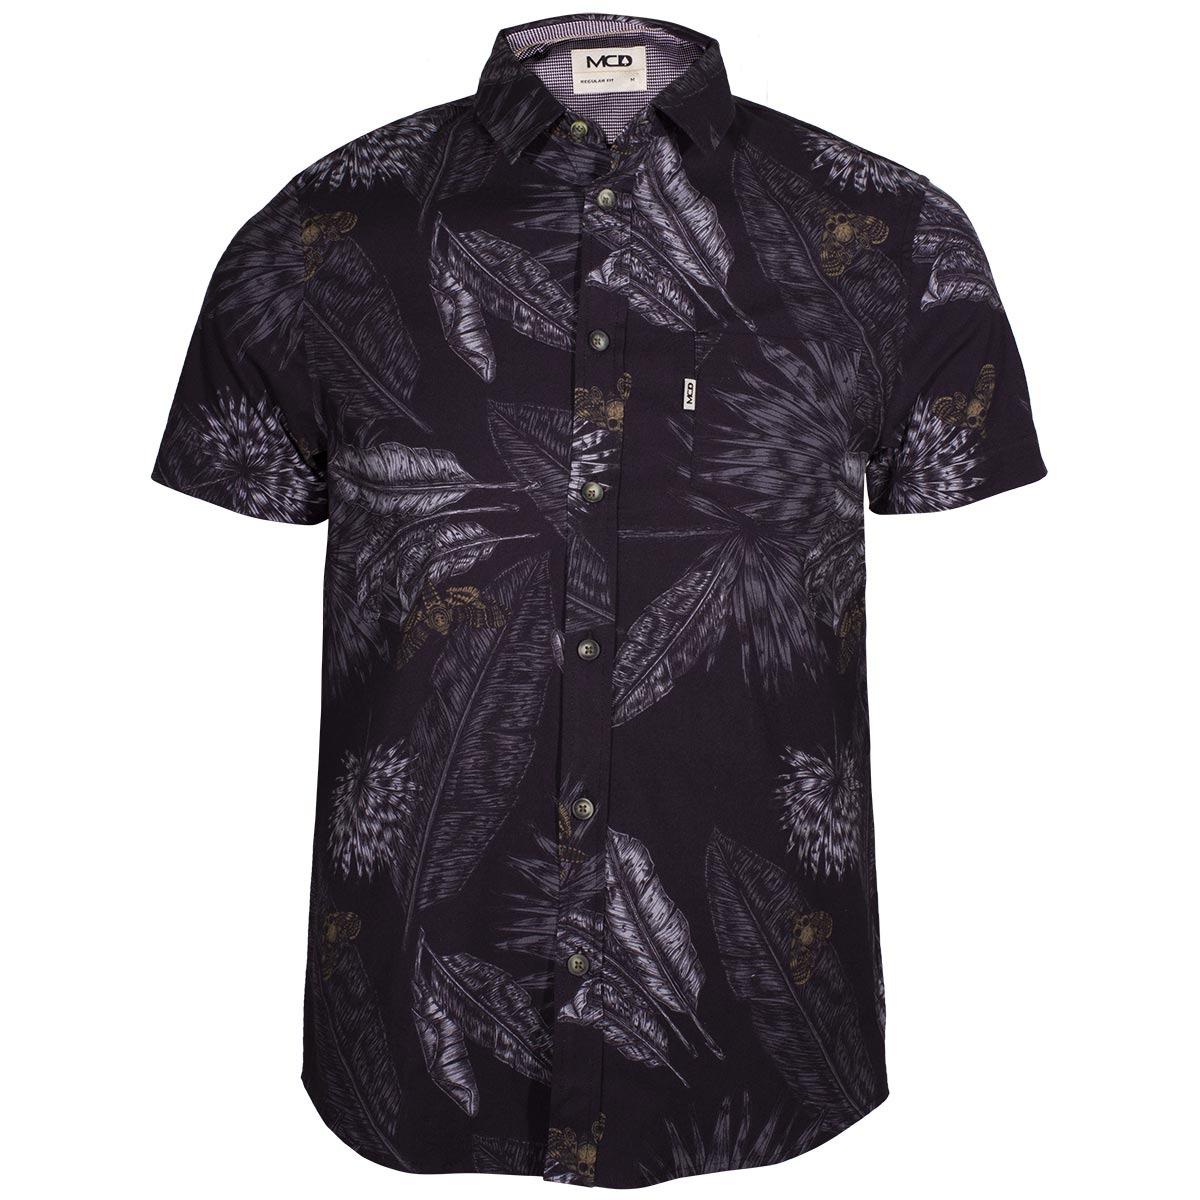 Camisa Mcd Leaves - Preto floral - R  279 9d7de352b6e